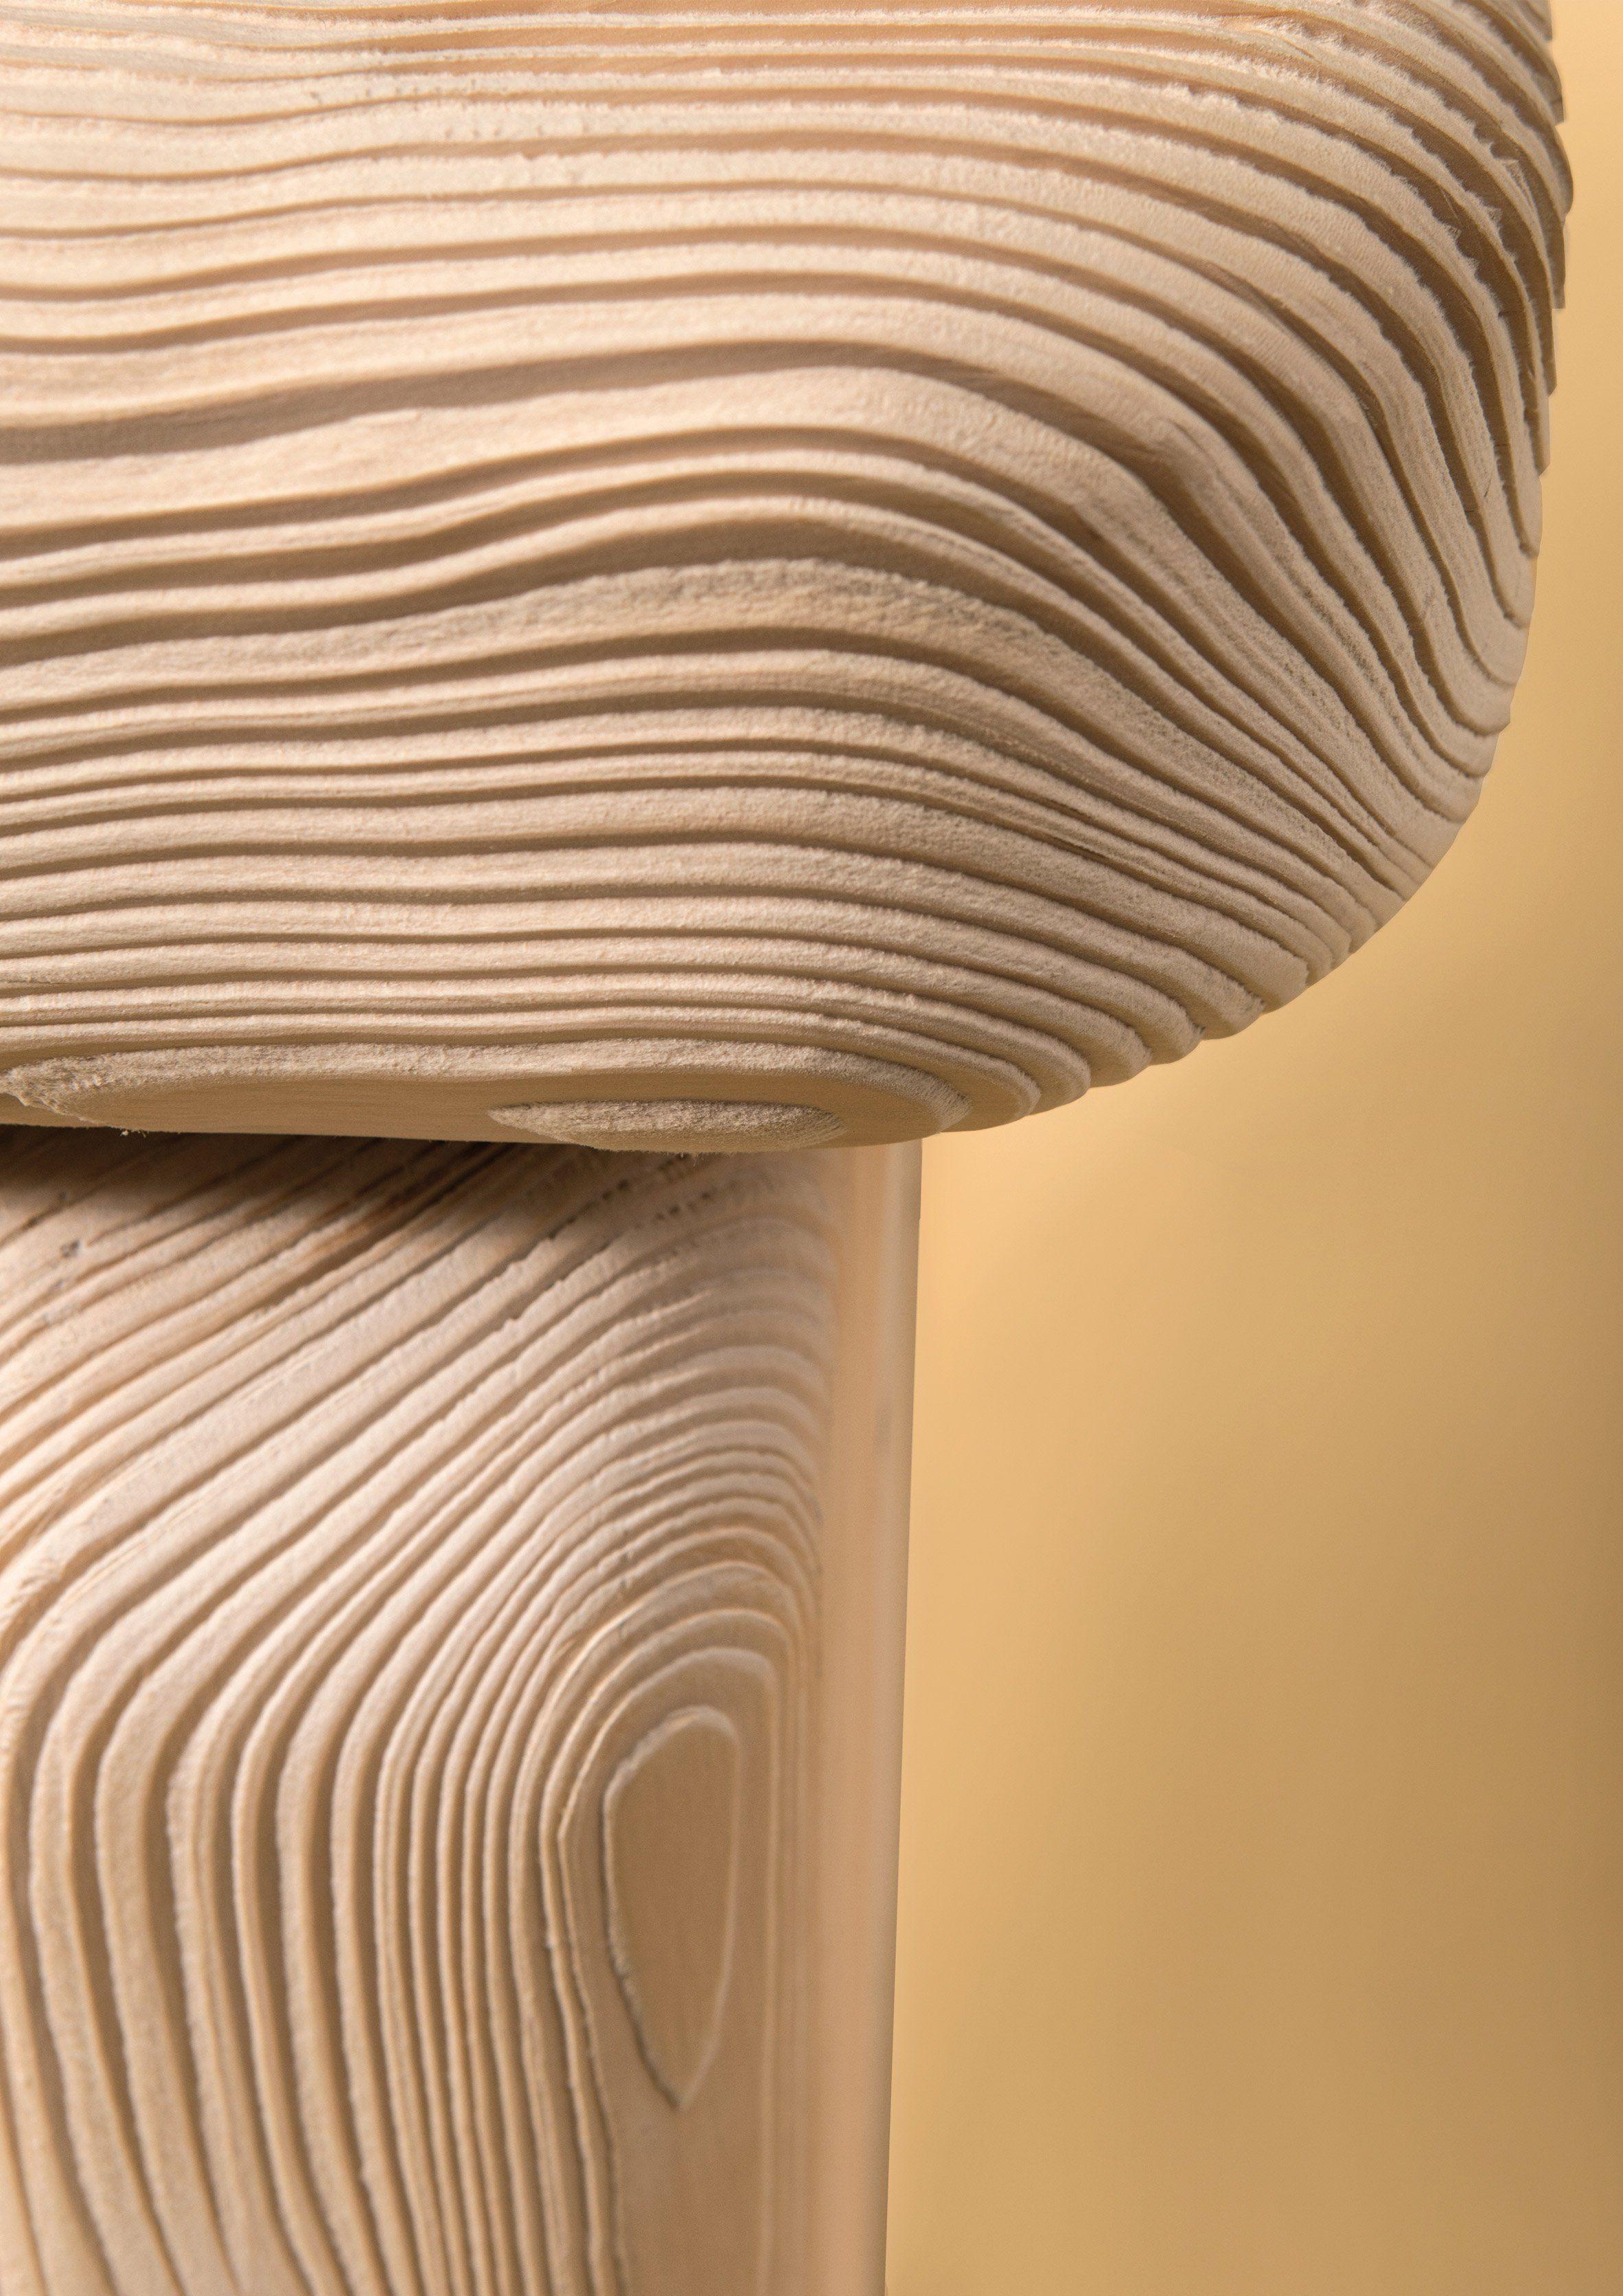 Sandblasting Wood Furniture Furniture Designs